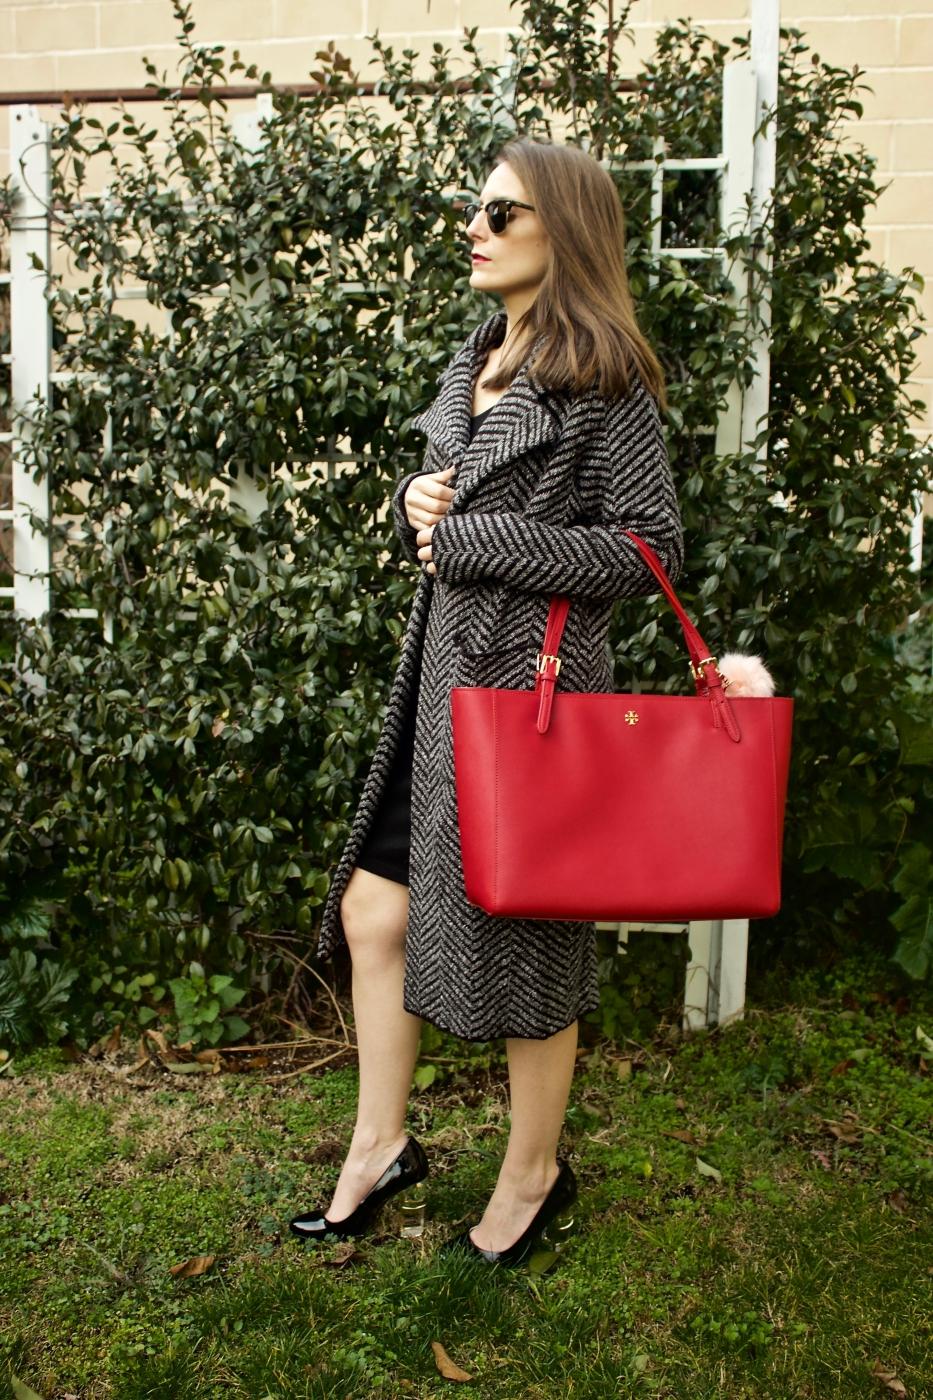 lara-vazquez-madlula-tory-burch-bag-look-ootd-fashion-blog-glam